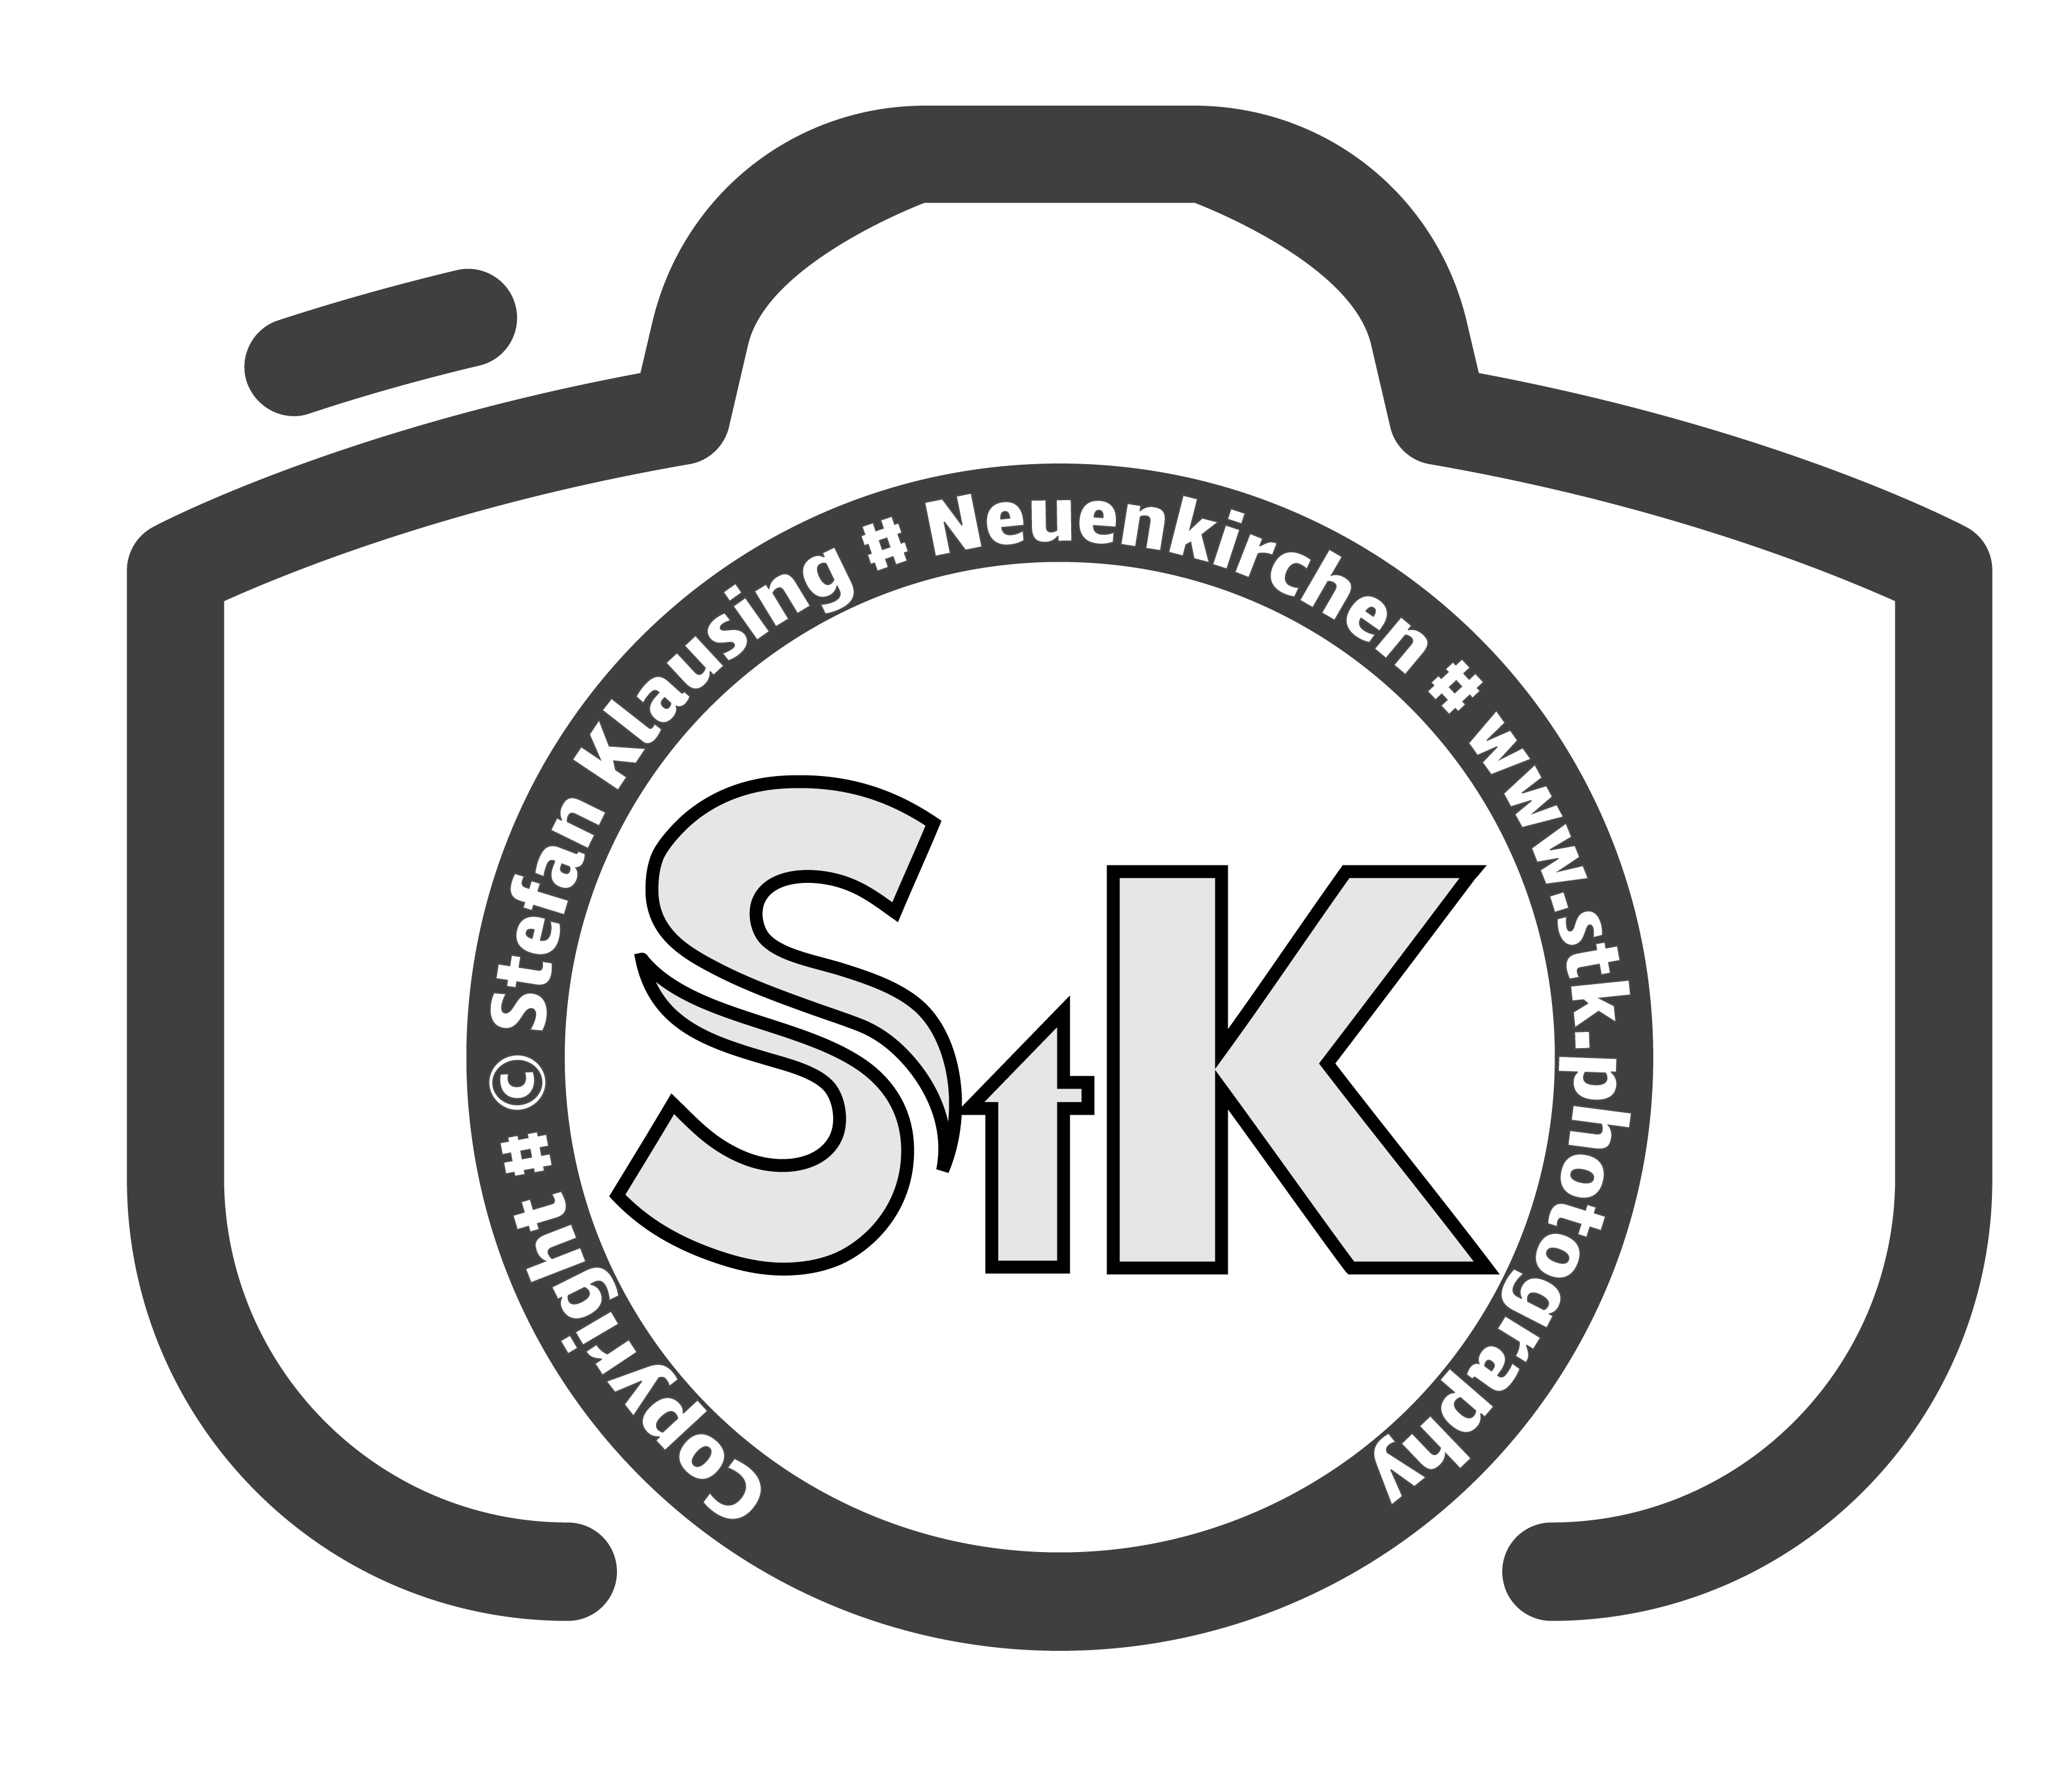 stk.photography